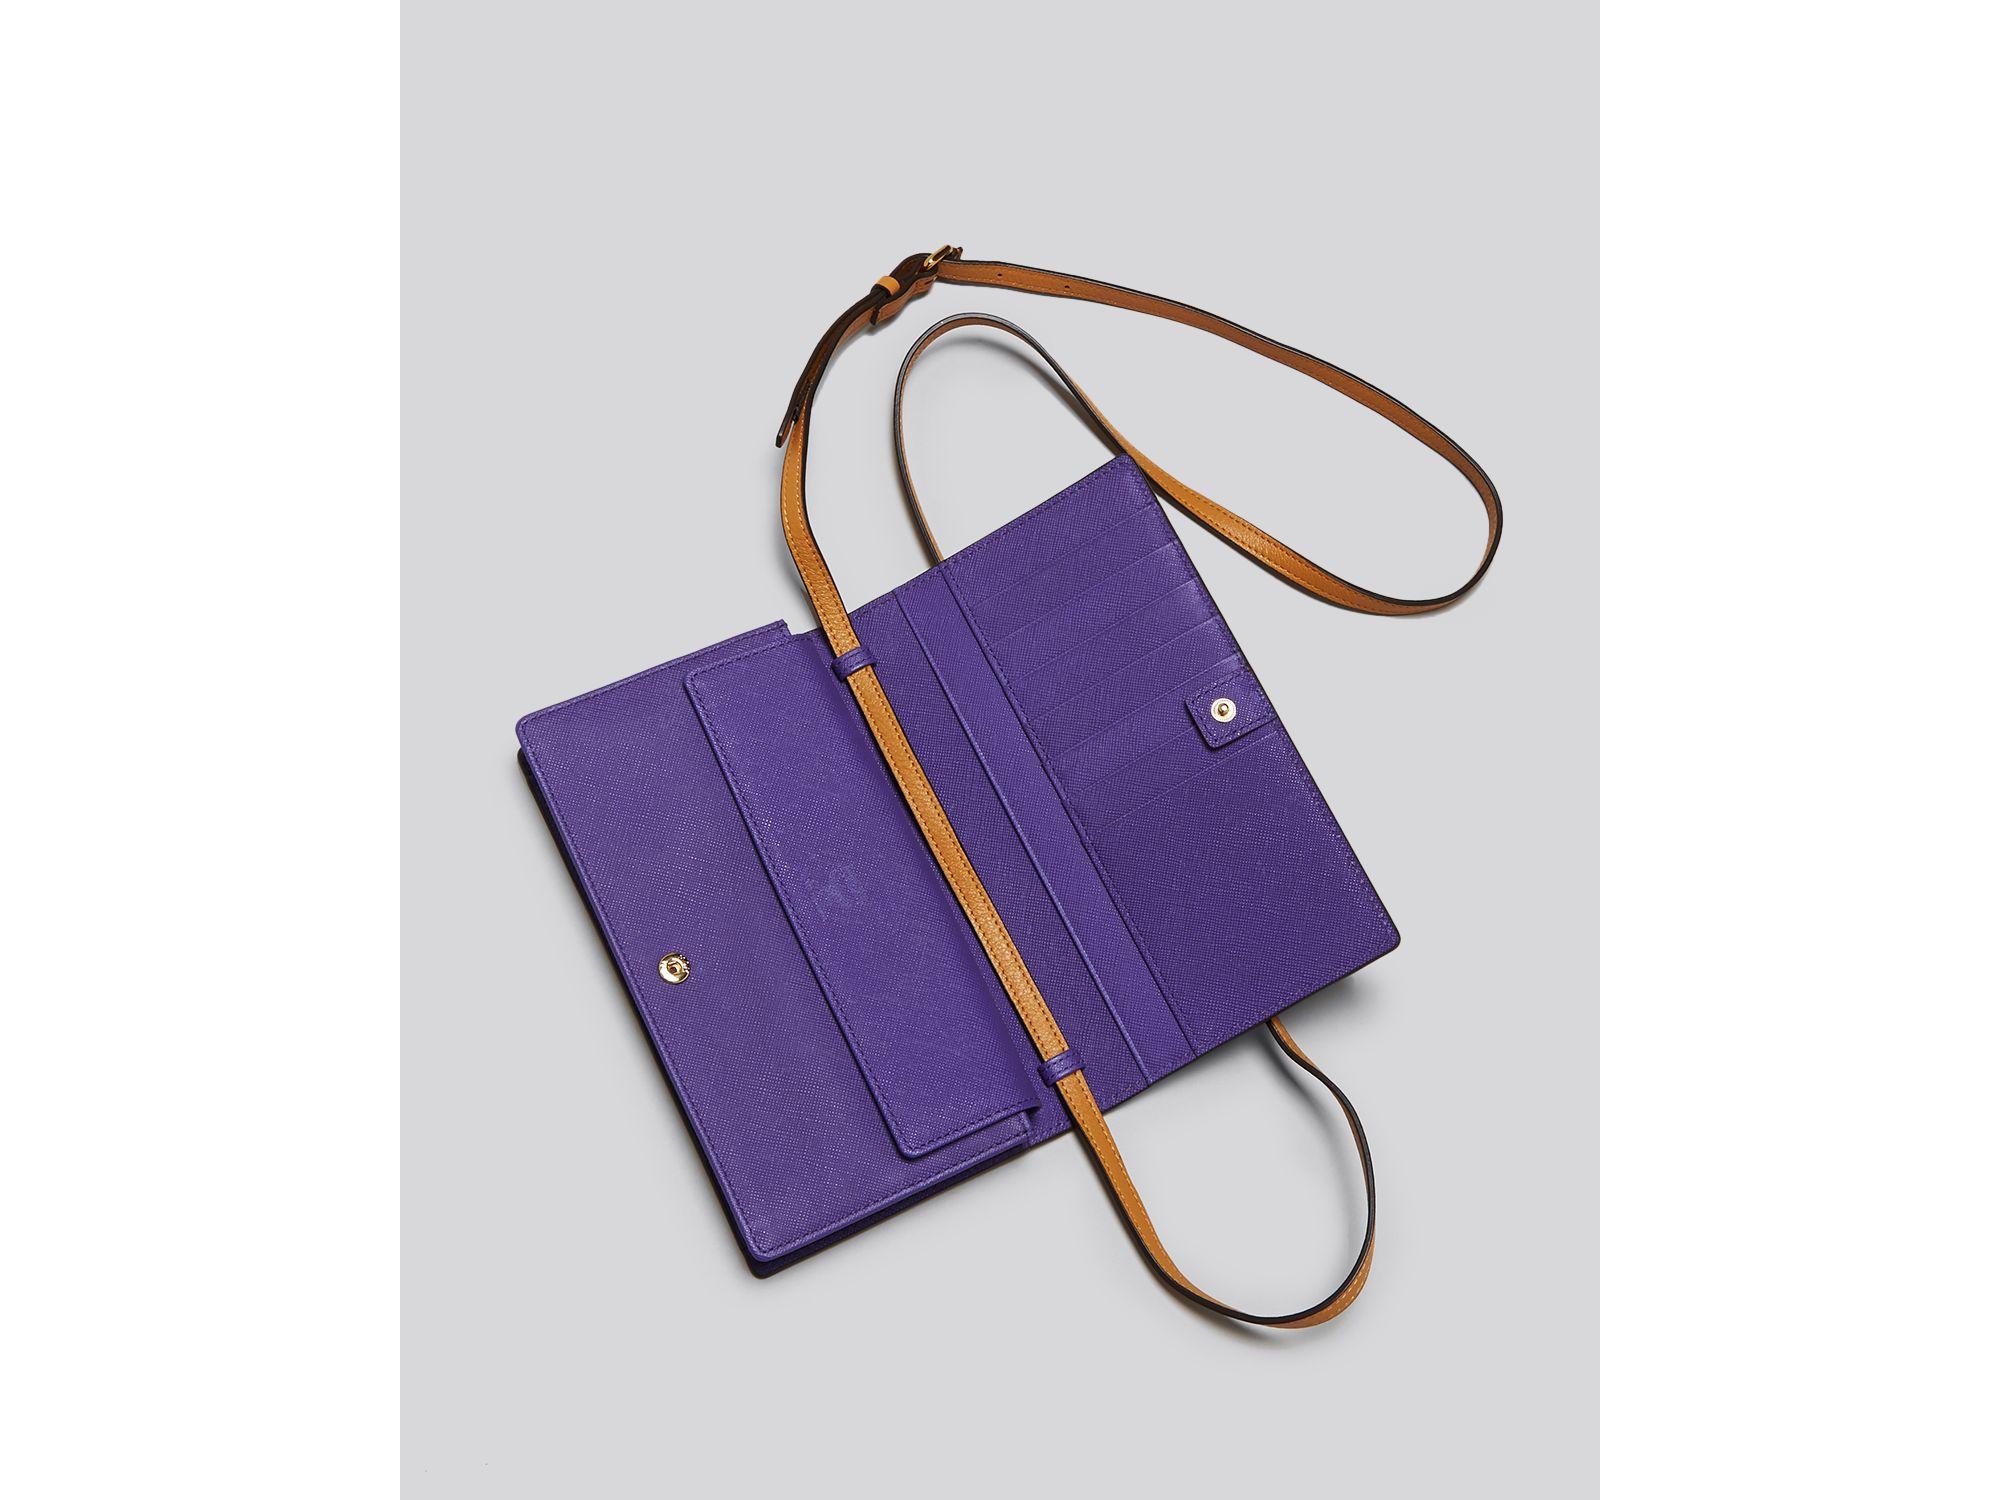 Lyst - Mcm Crossbody - Visetos Colorblock Wallet in Brown